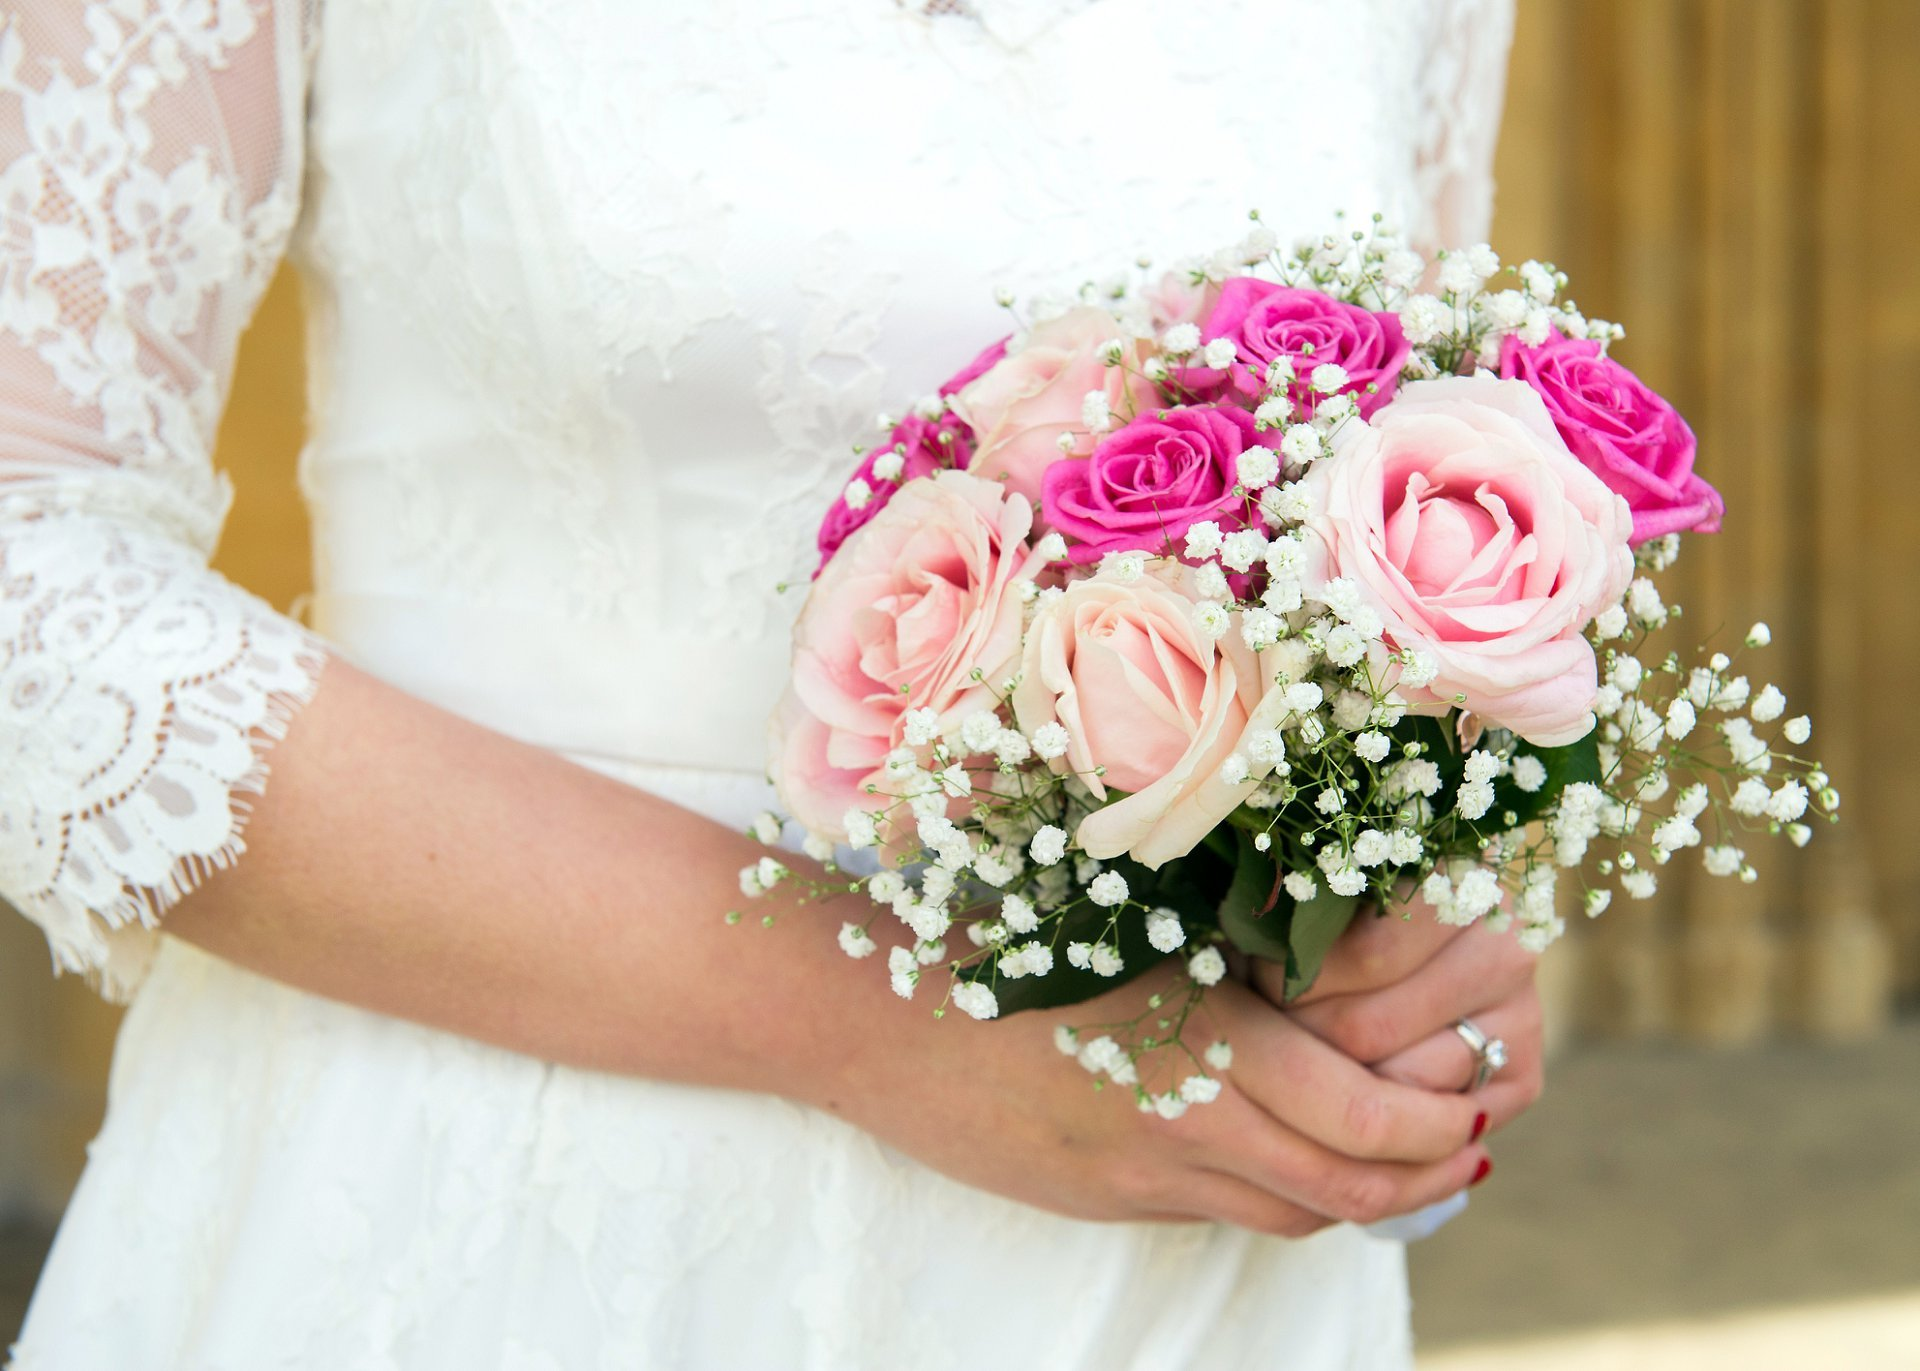 emma duggan photographer for elegant wedding photogrpahy in chelsea london